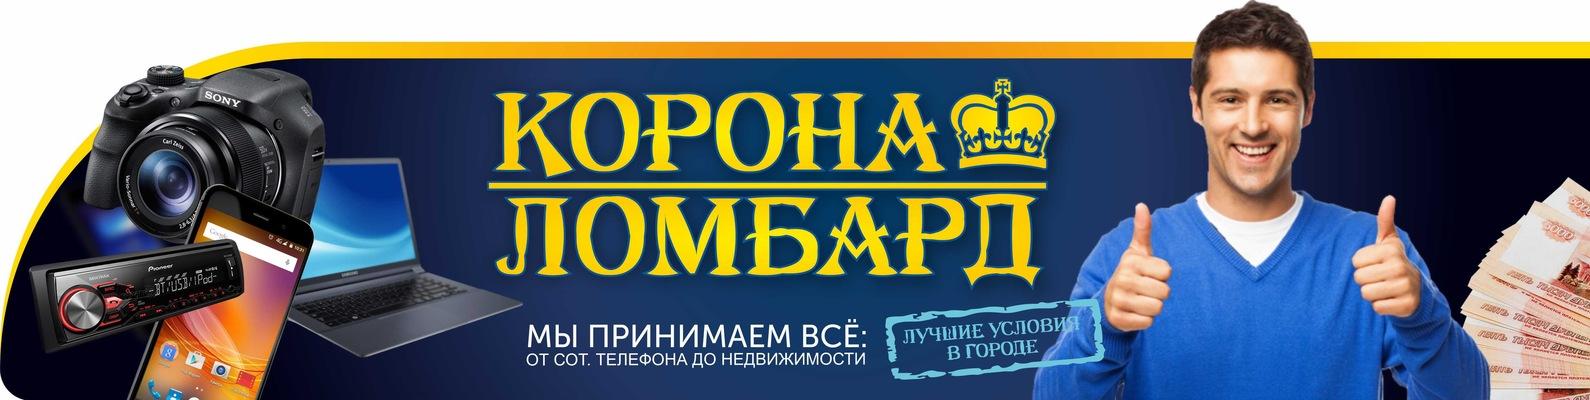 c9d33a14aa65 ЛОМБАРД КОРОНА г. Ульяновск   ВКонтакте